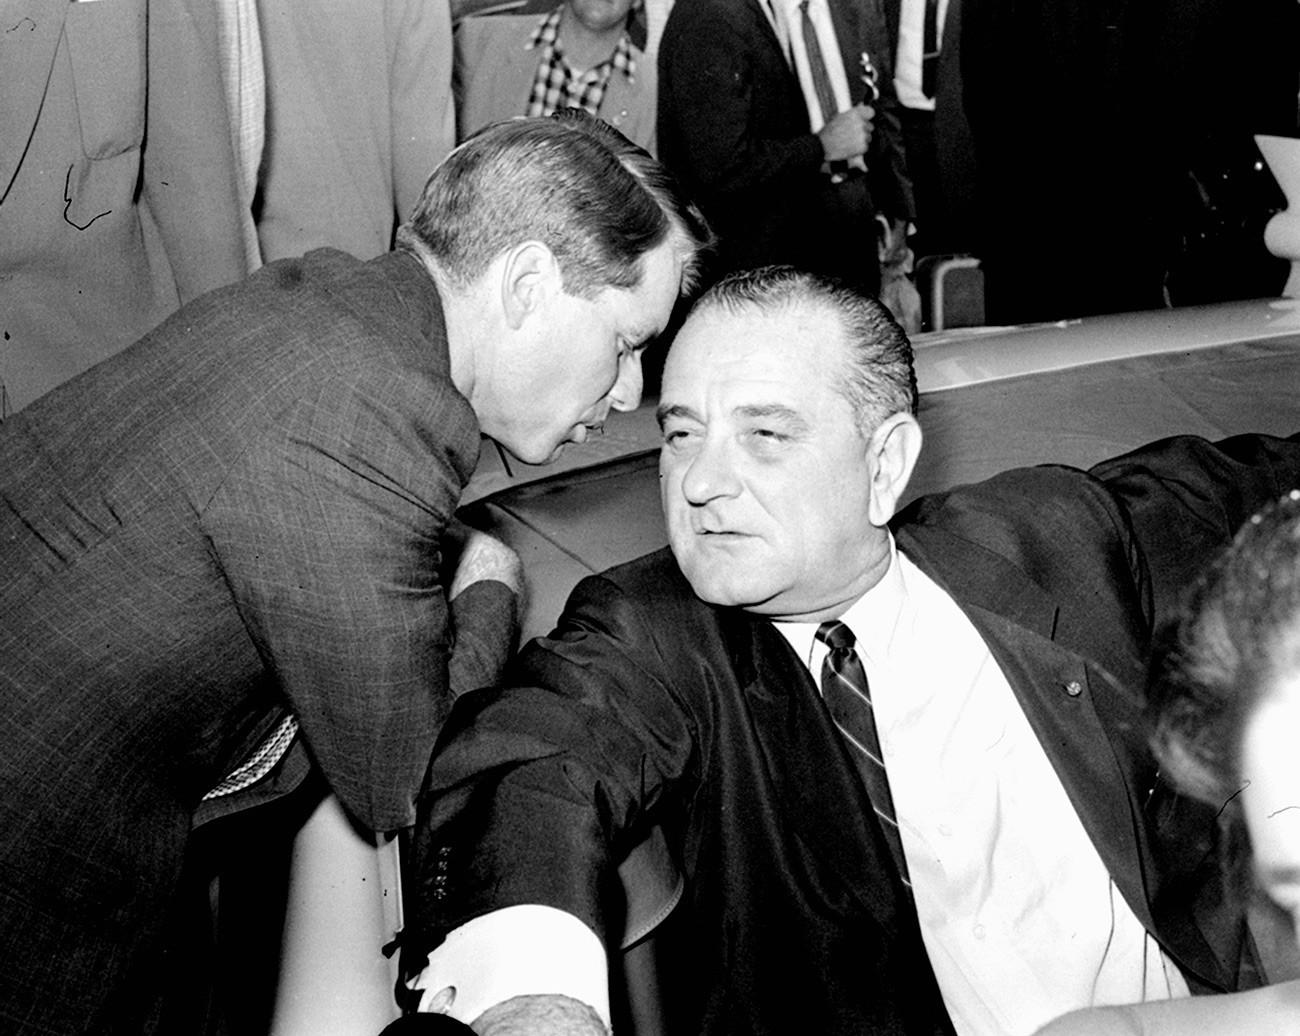 Robert Kennedy in Lyndon B. Johnson